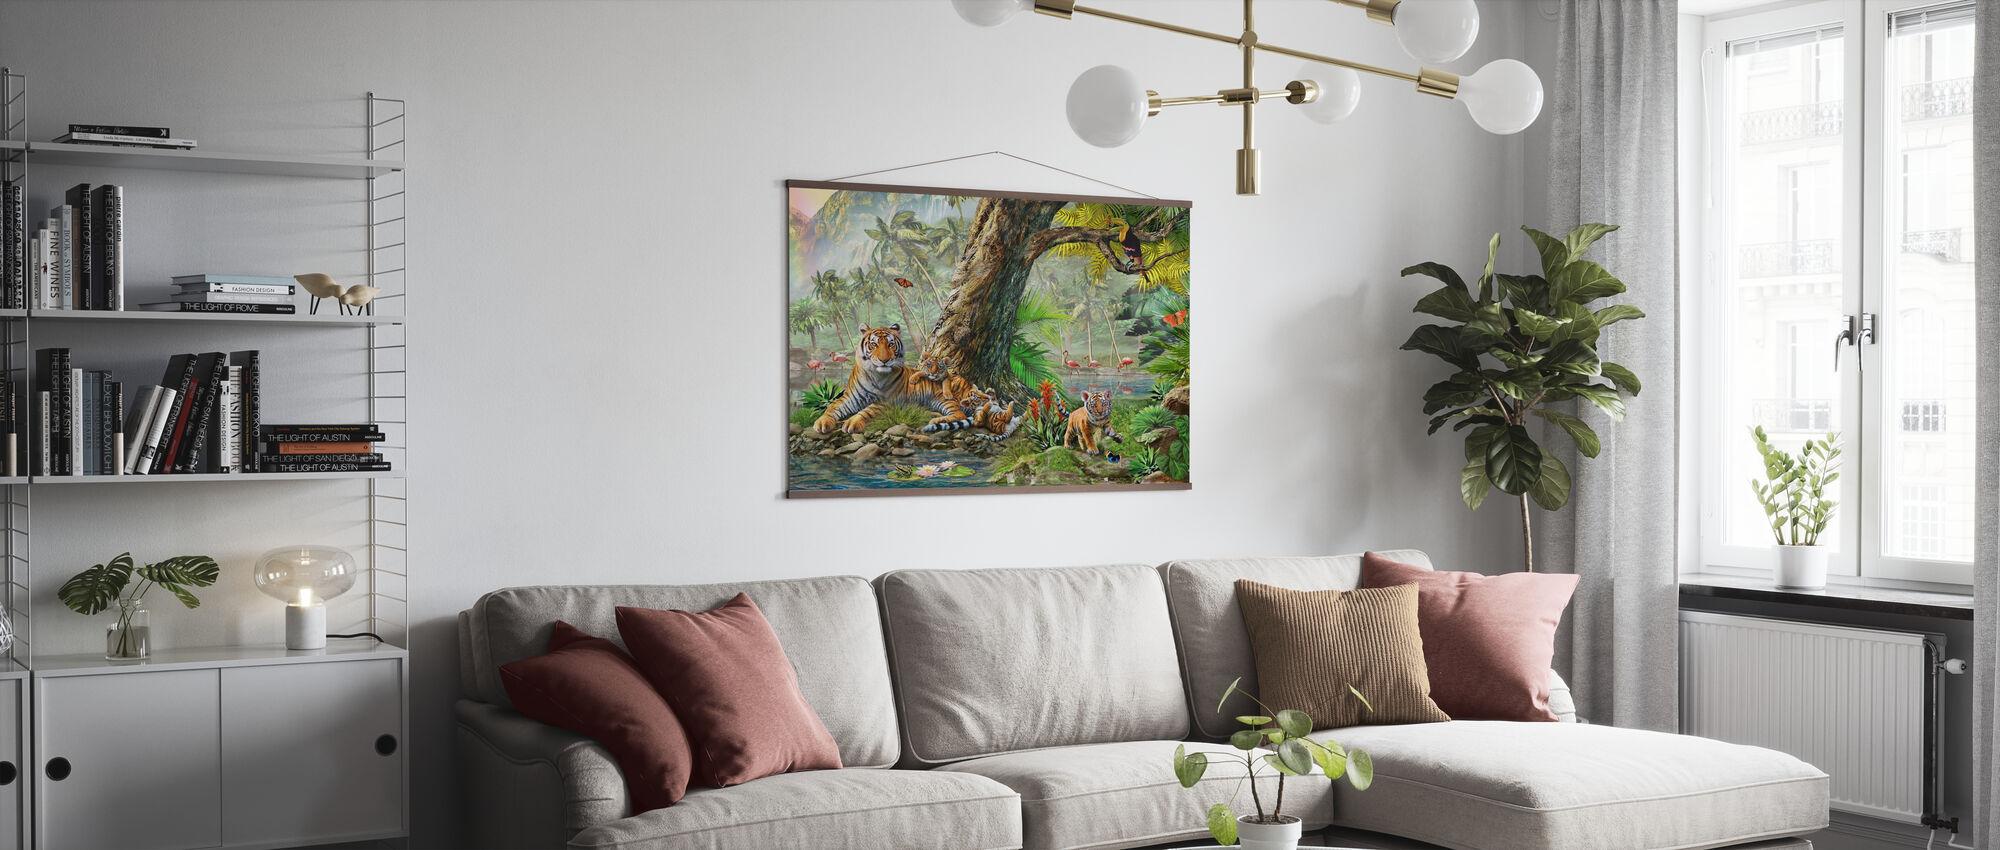 Land en water Utopia III - Poster - Woonkamer